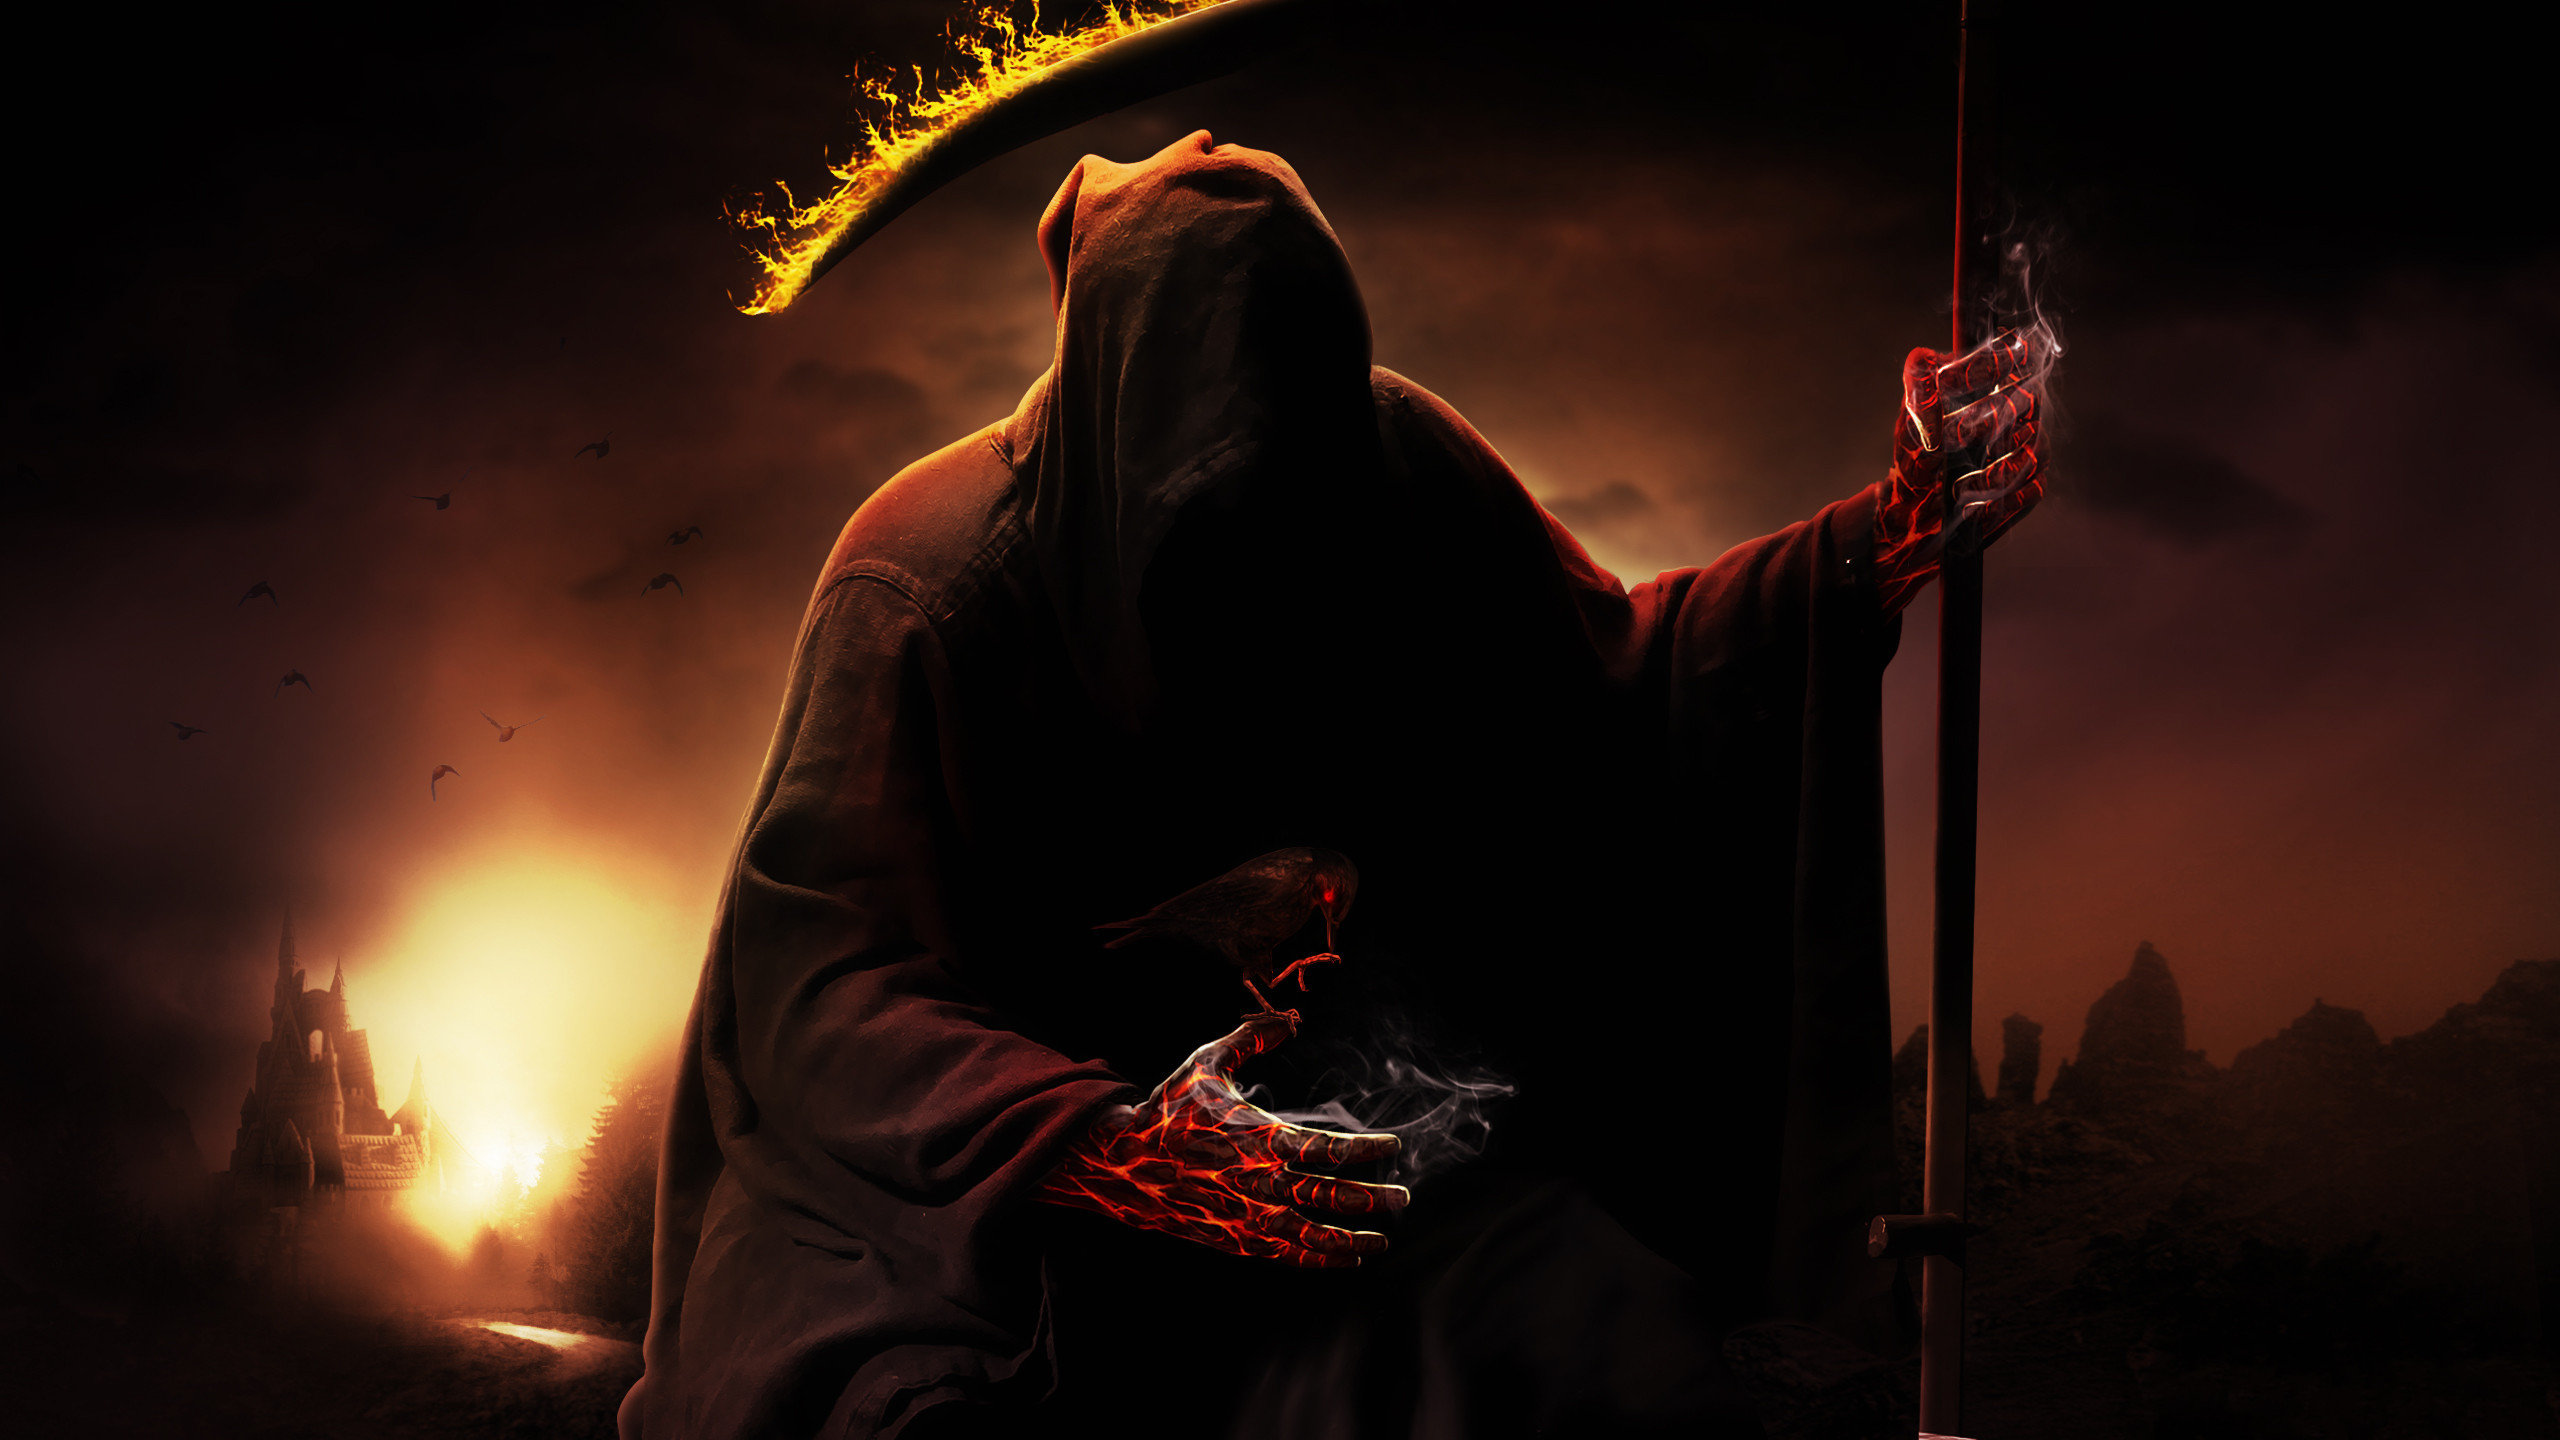 grim-reaper-wallpaper-hd-2560x1440-155342